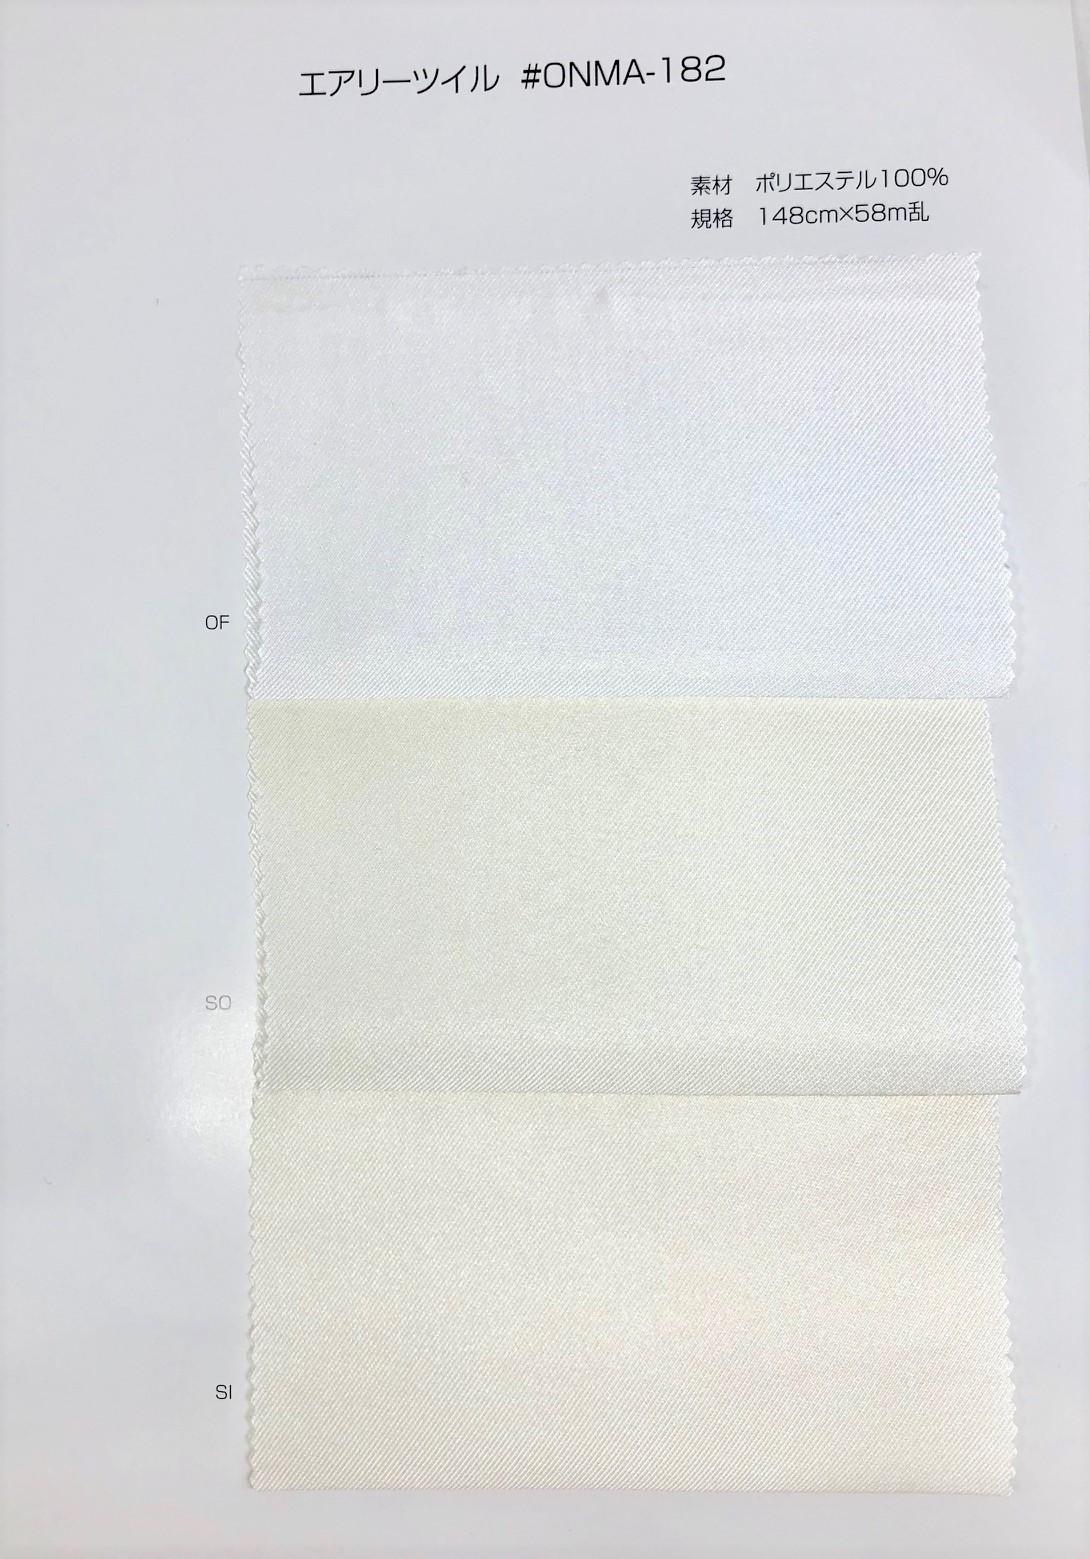 ONMA-182 エアリーツイル[生地] サンコロナ小田/オークラ商事 - ApparelX アパレル資材卸通販